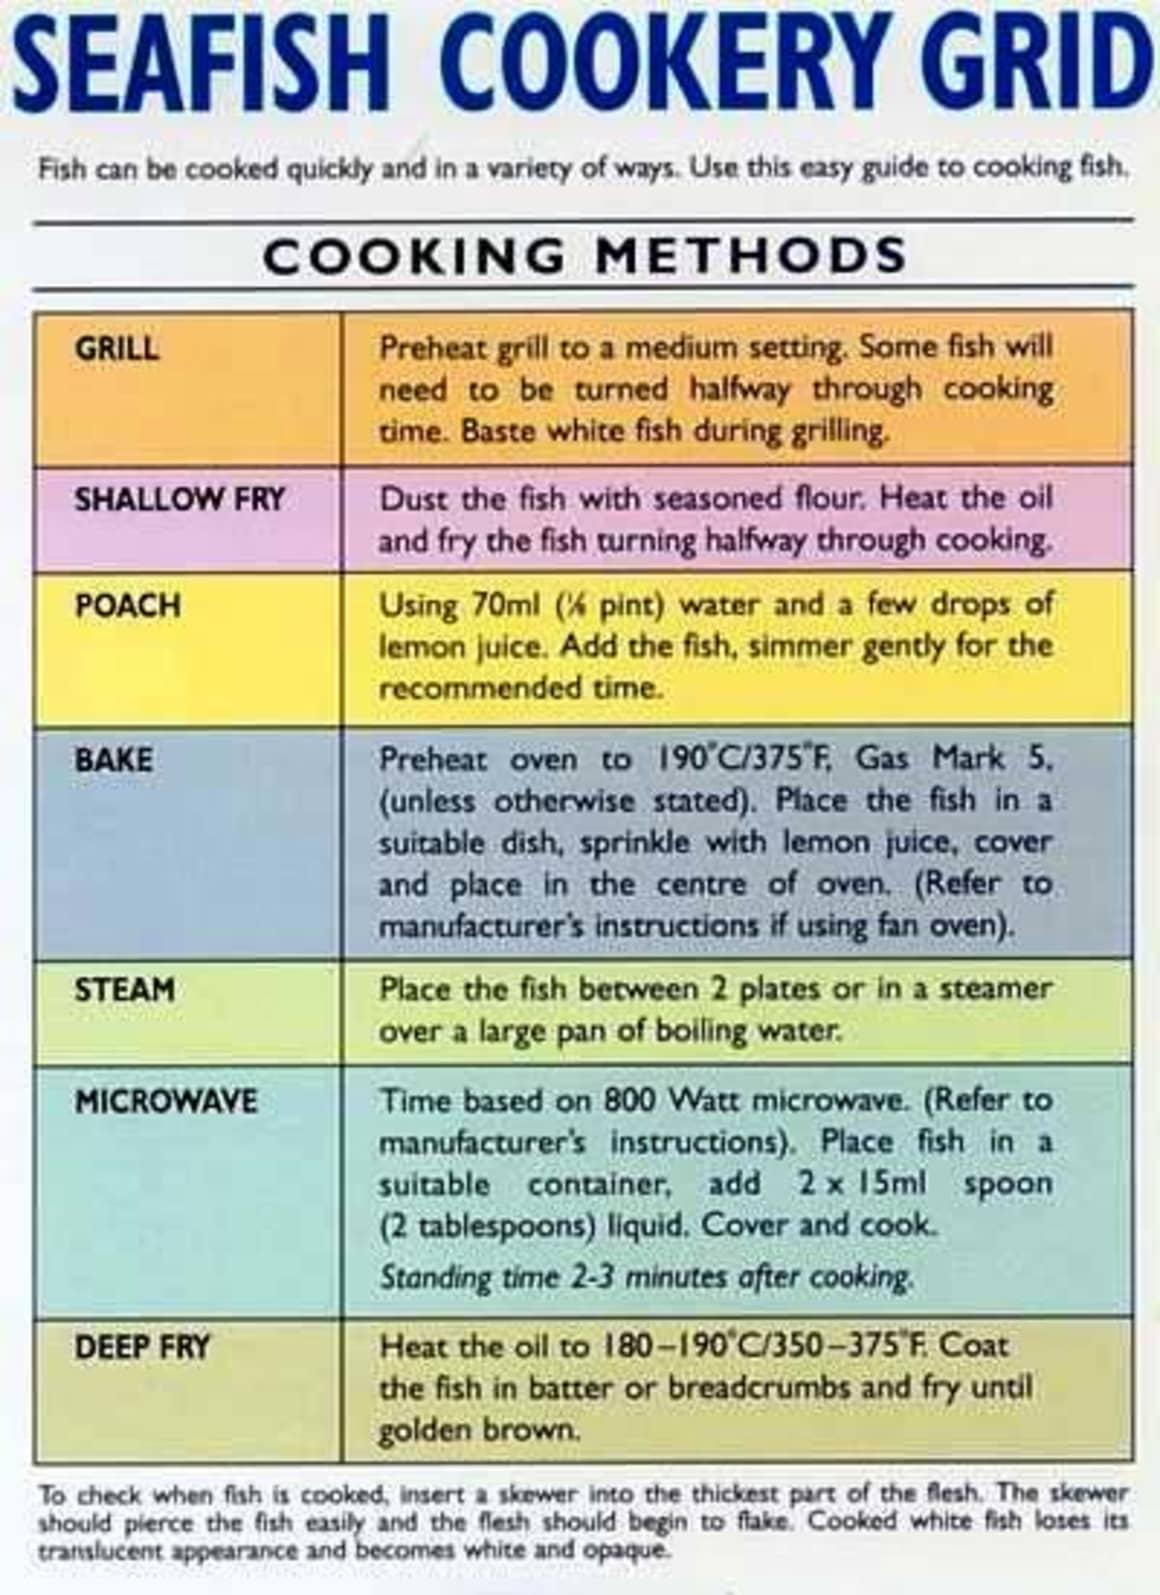 Seafish cookery grid